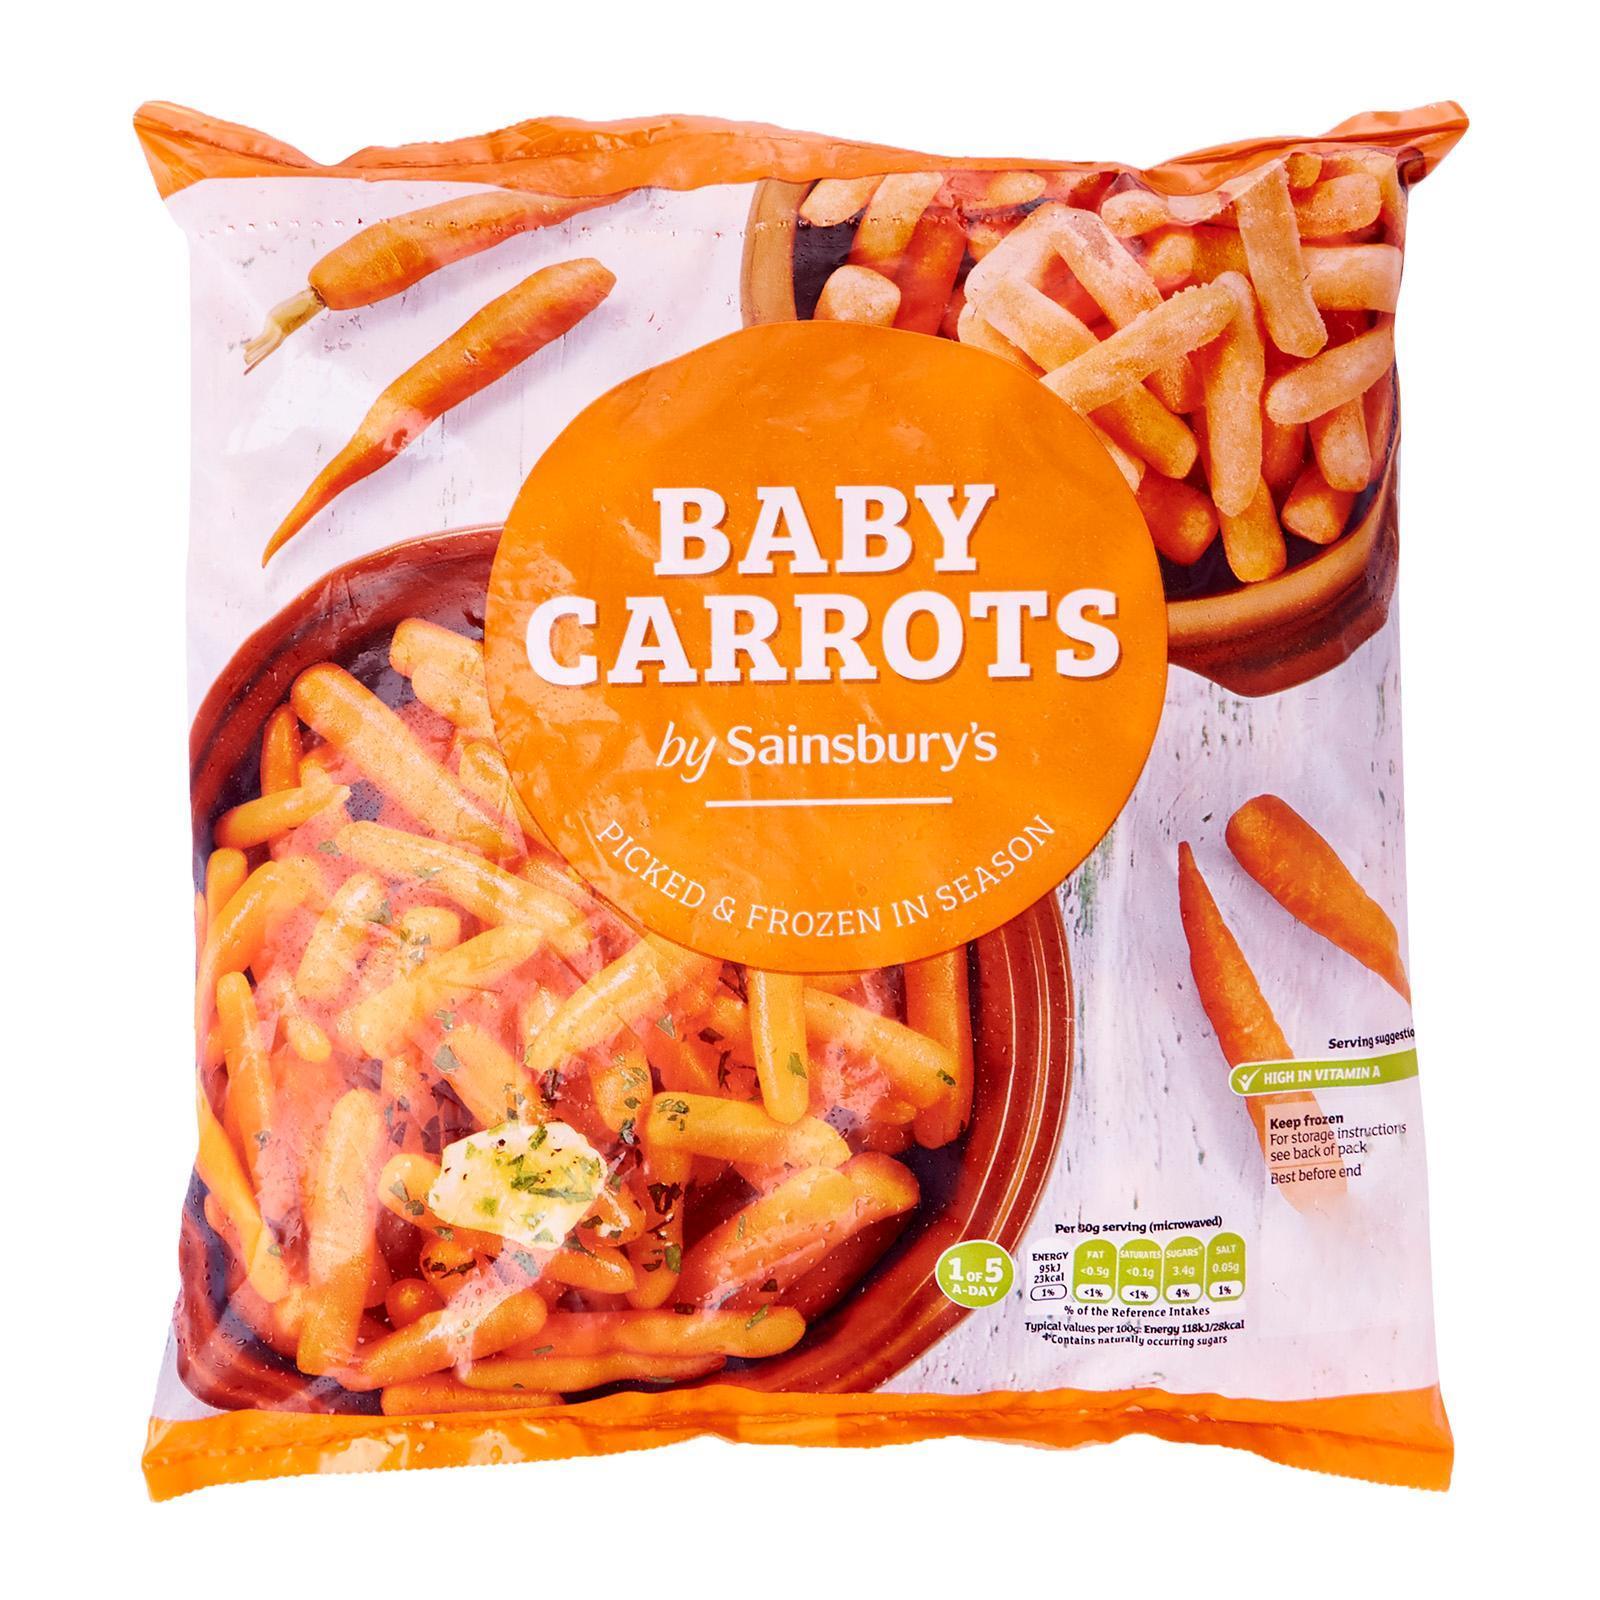 Sainsbury's Baby Carrots - Frozen